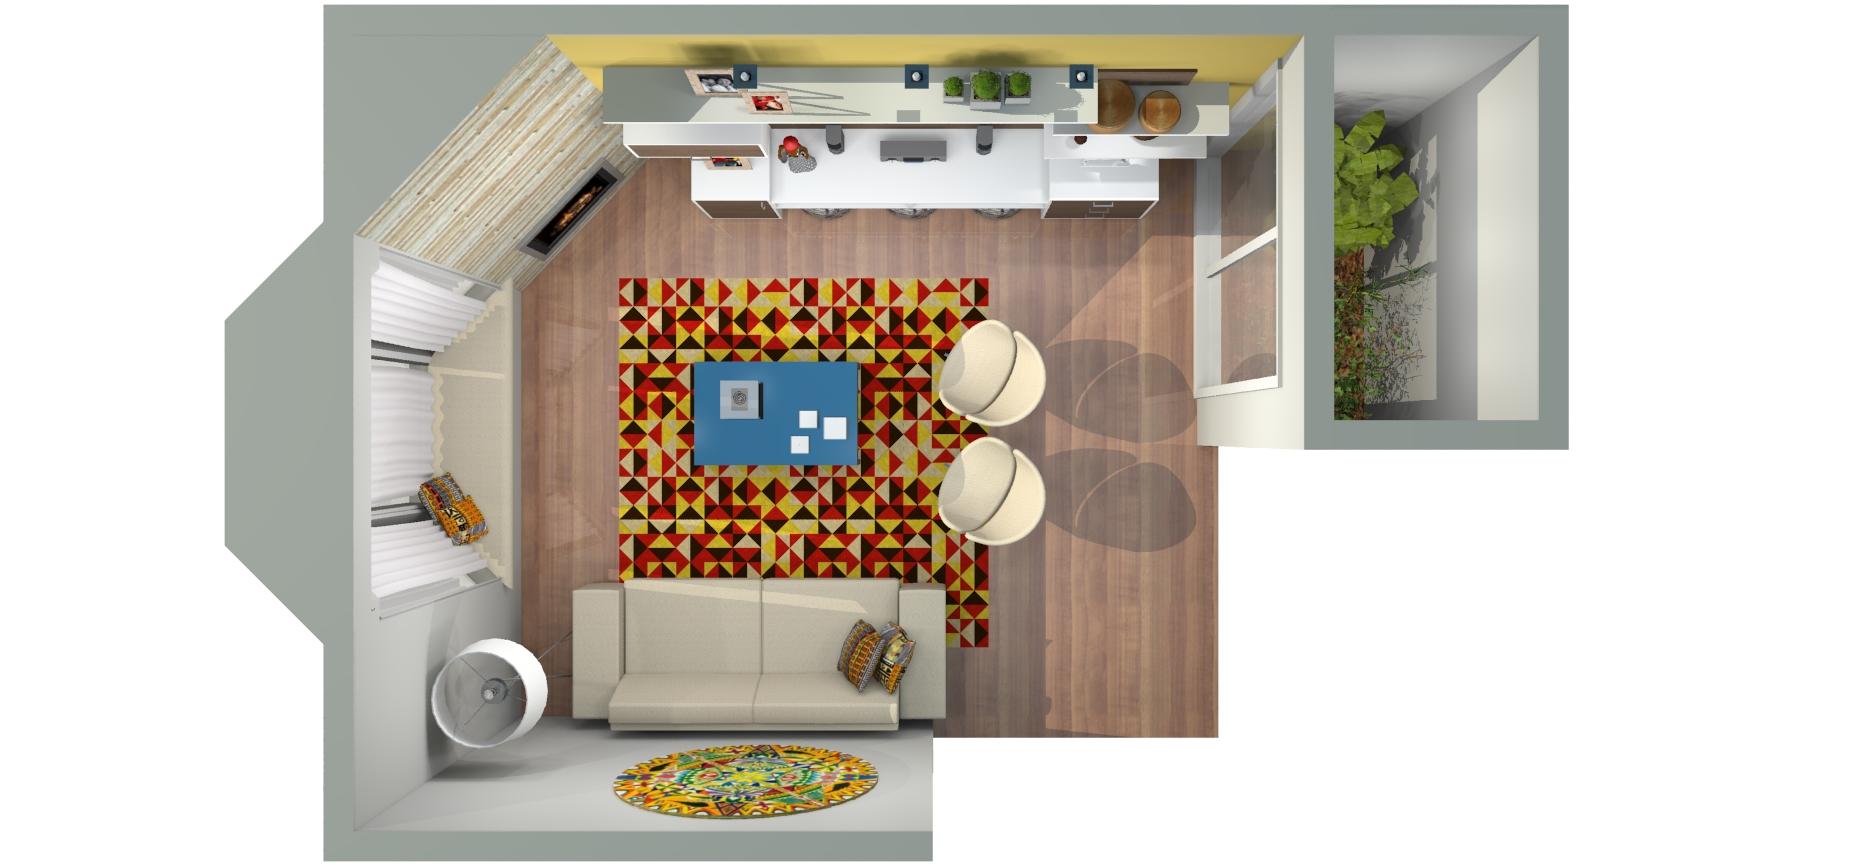 R 1 planta baixa sala de estar